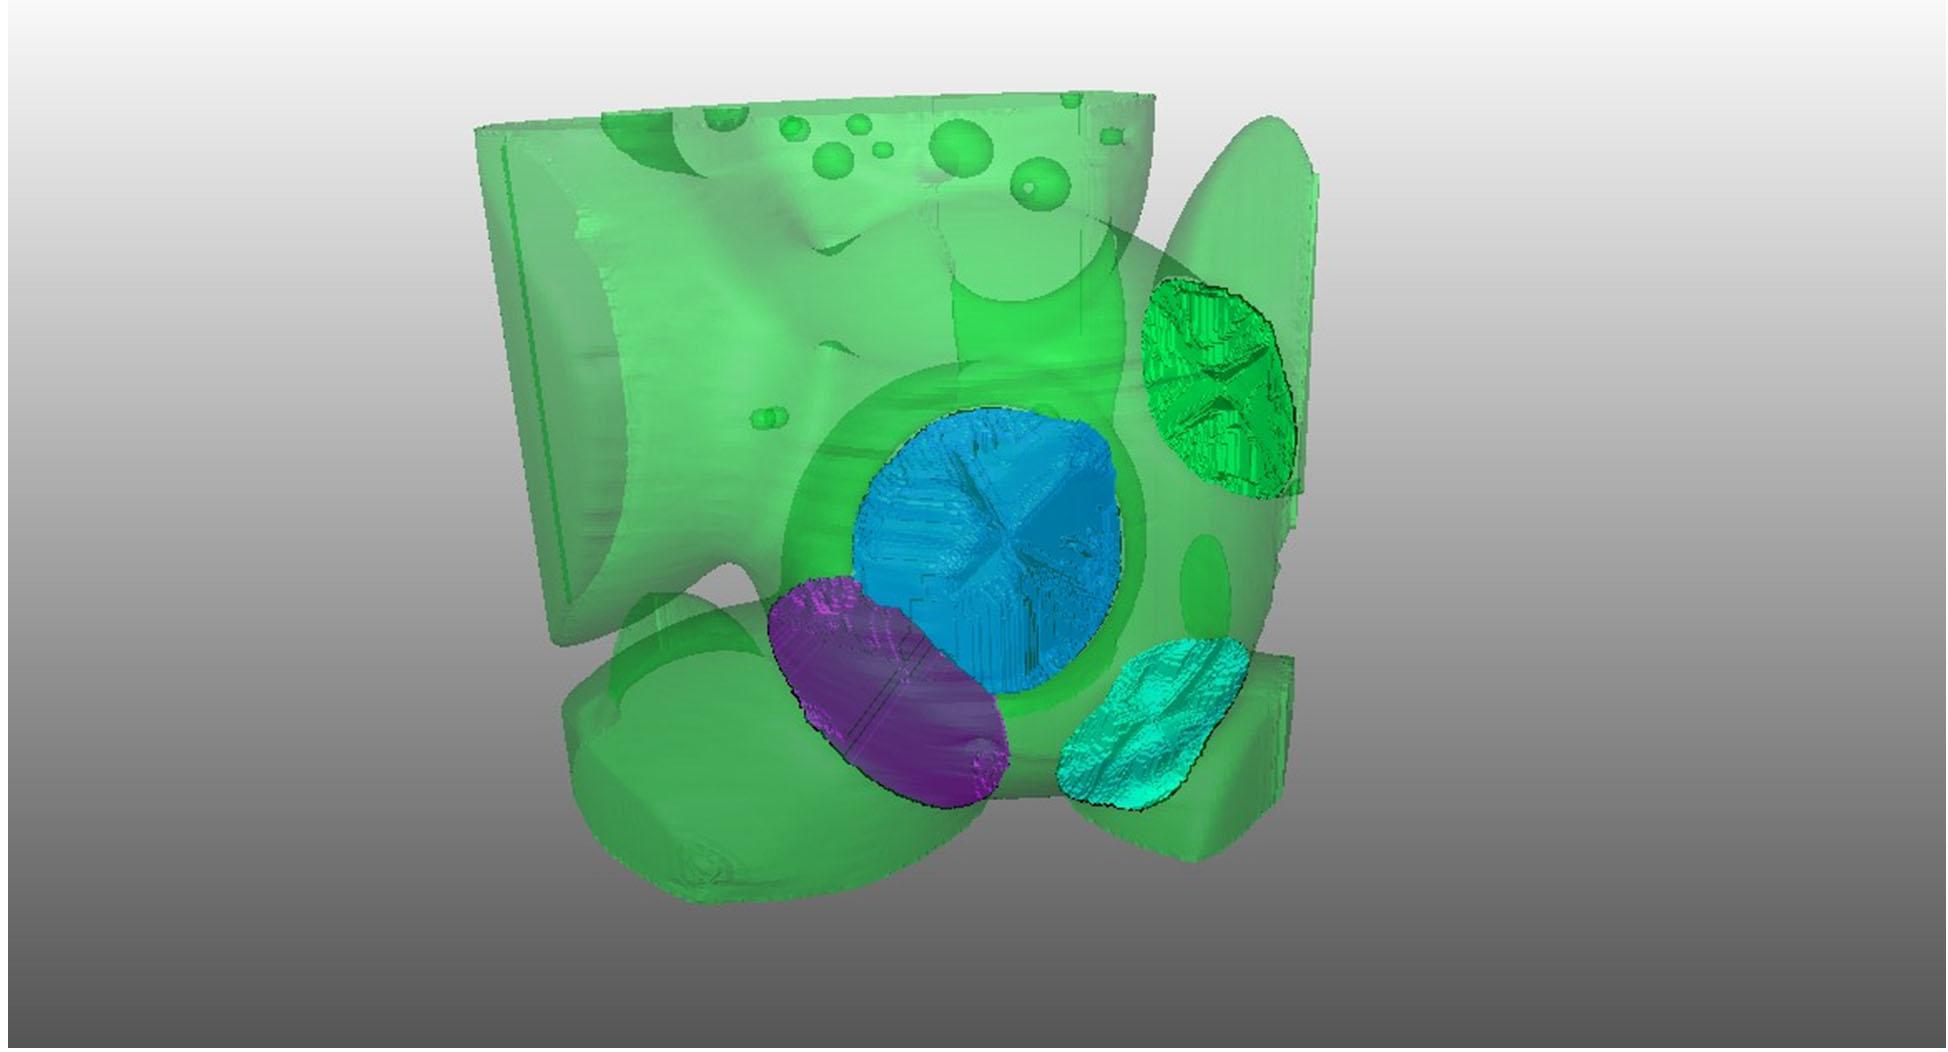 ESRF Spotlight Nanotomogrpahie de frittage ultra-rapide